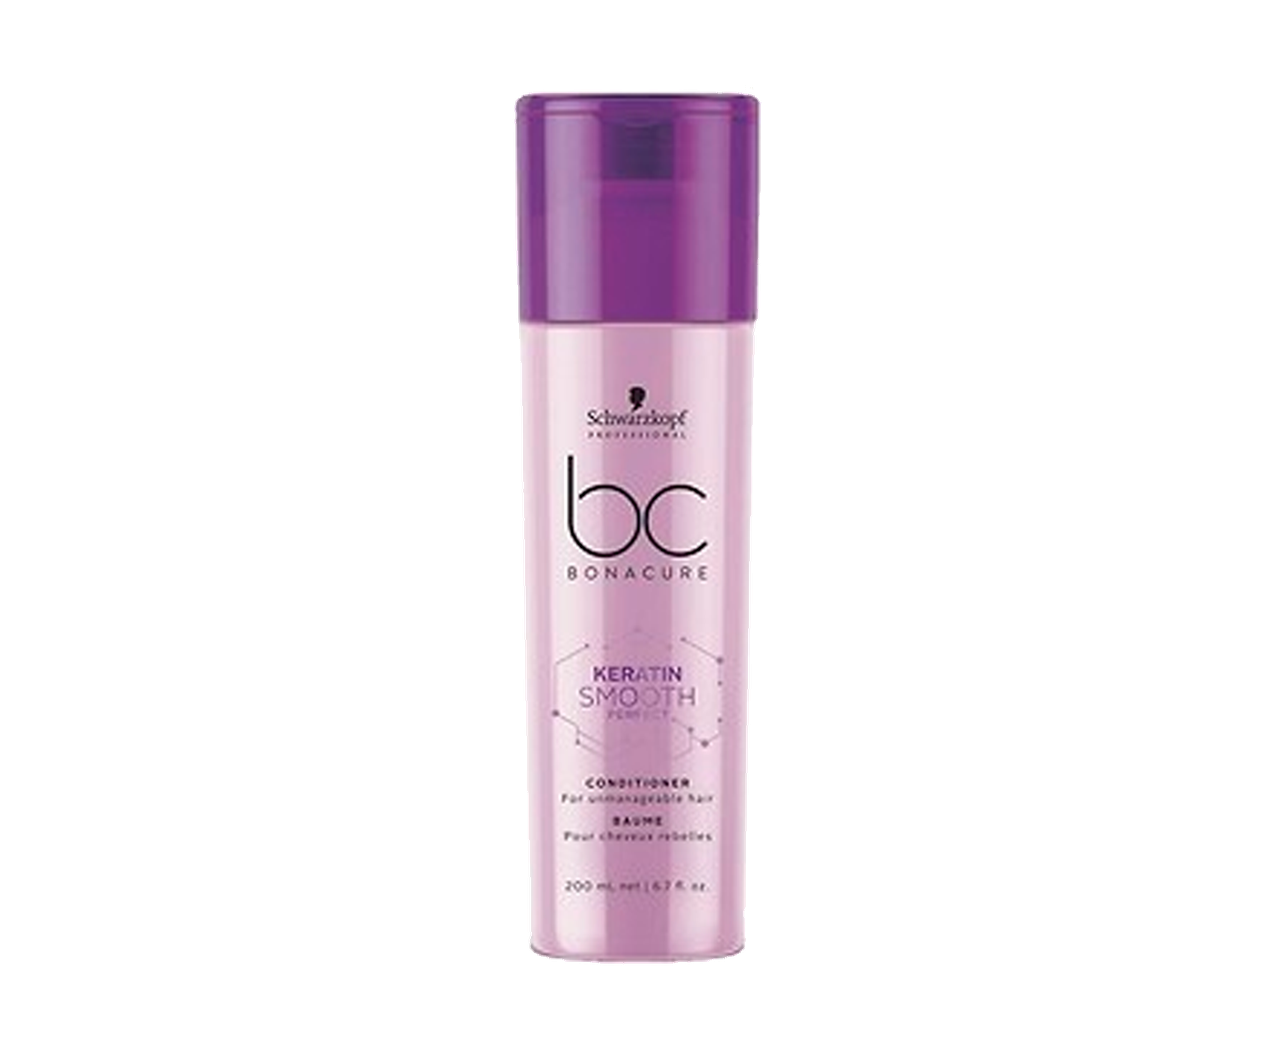 Кондиционер для гладкости волос Schwarzkopf Professional ВС Bonacure Keratin Smooth Perfect Keratin, 200 мл